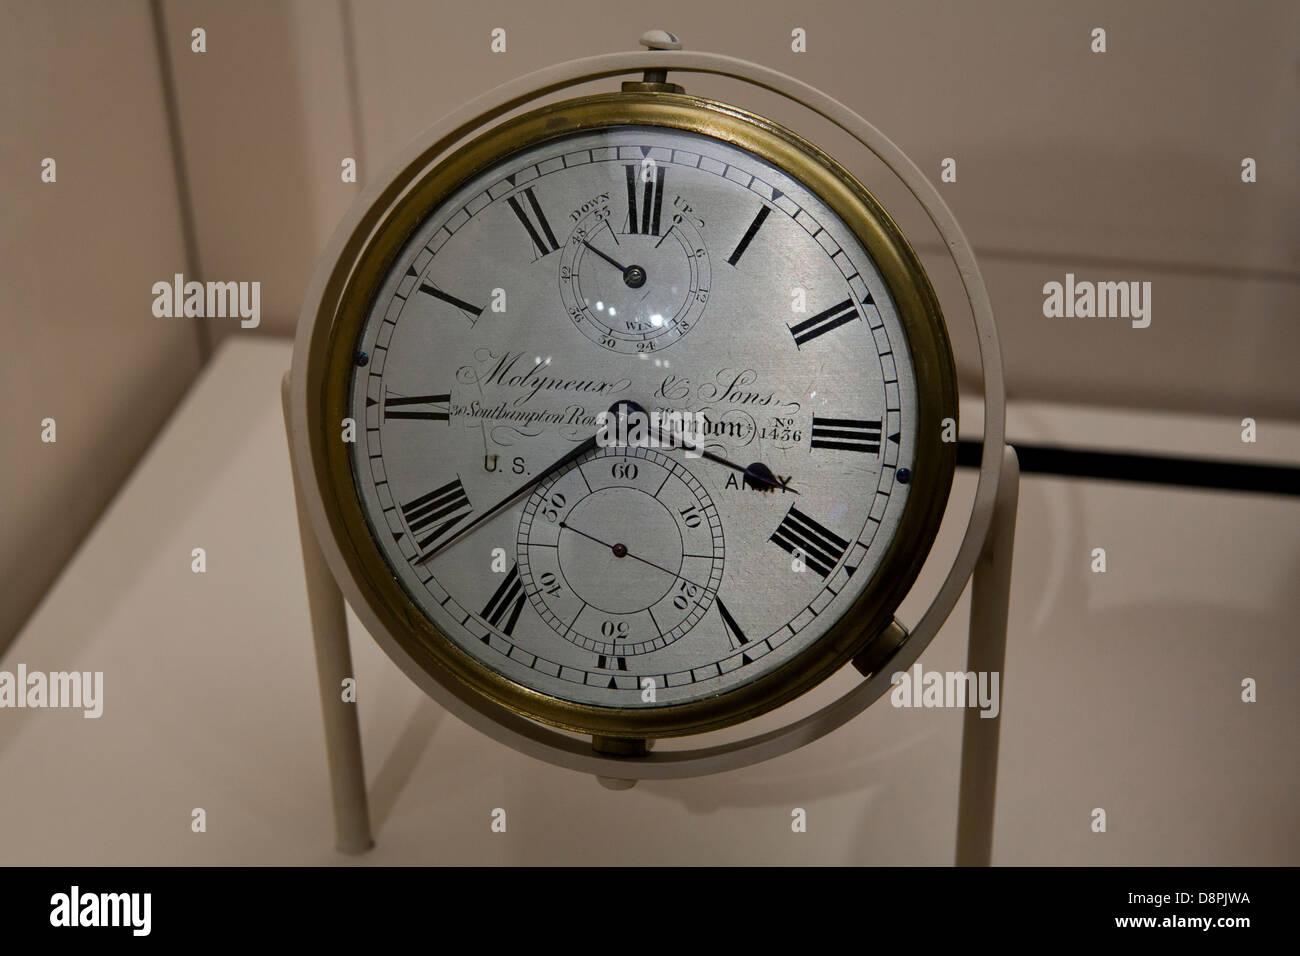 Marine chronometer by Molyneux & Sons no. 1436, ca 1830 - Stock Image